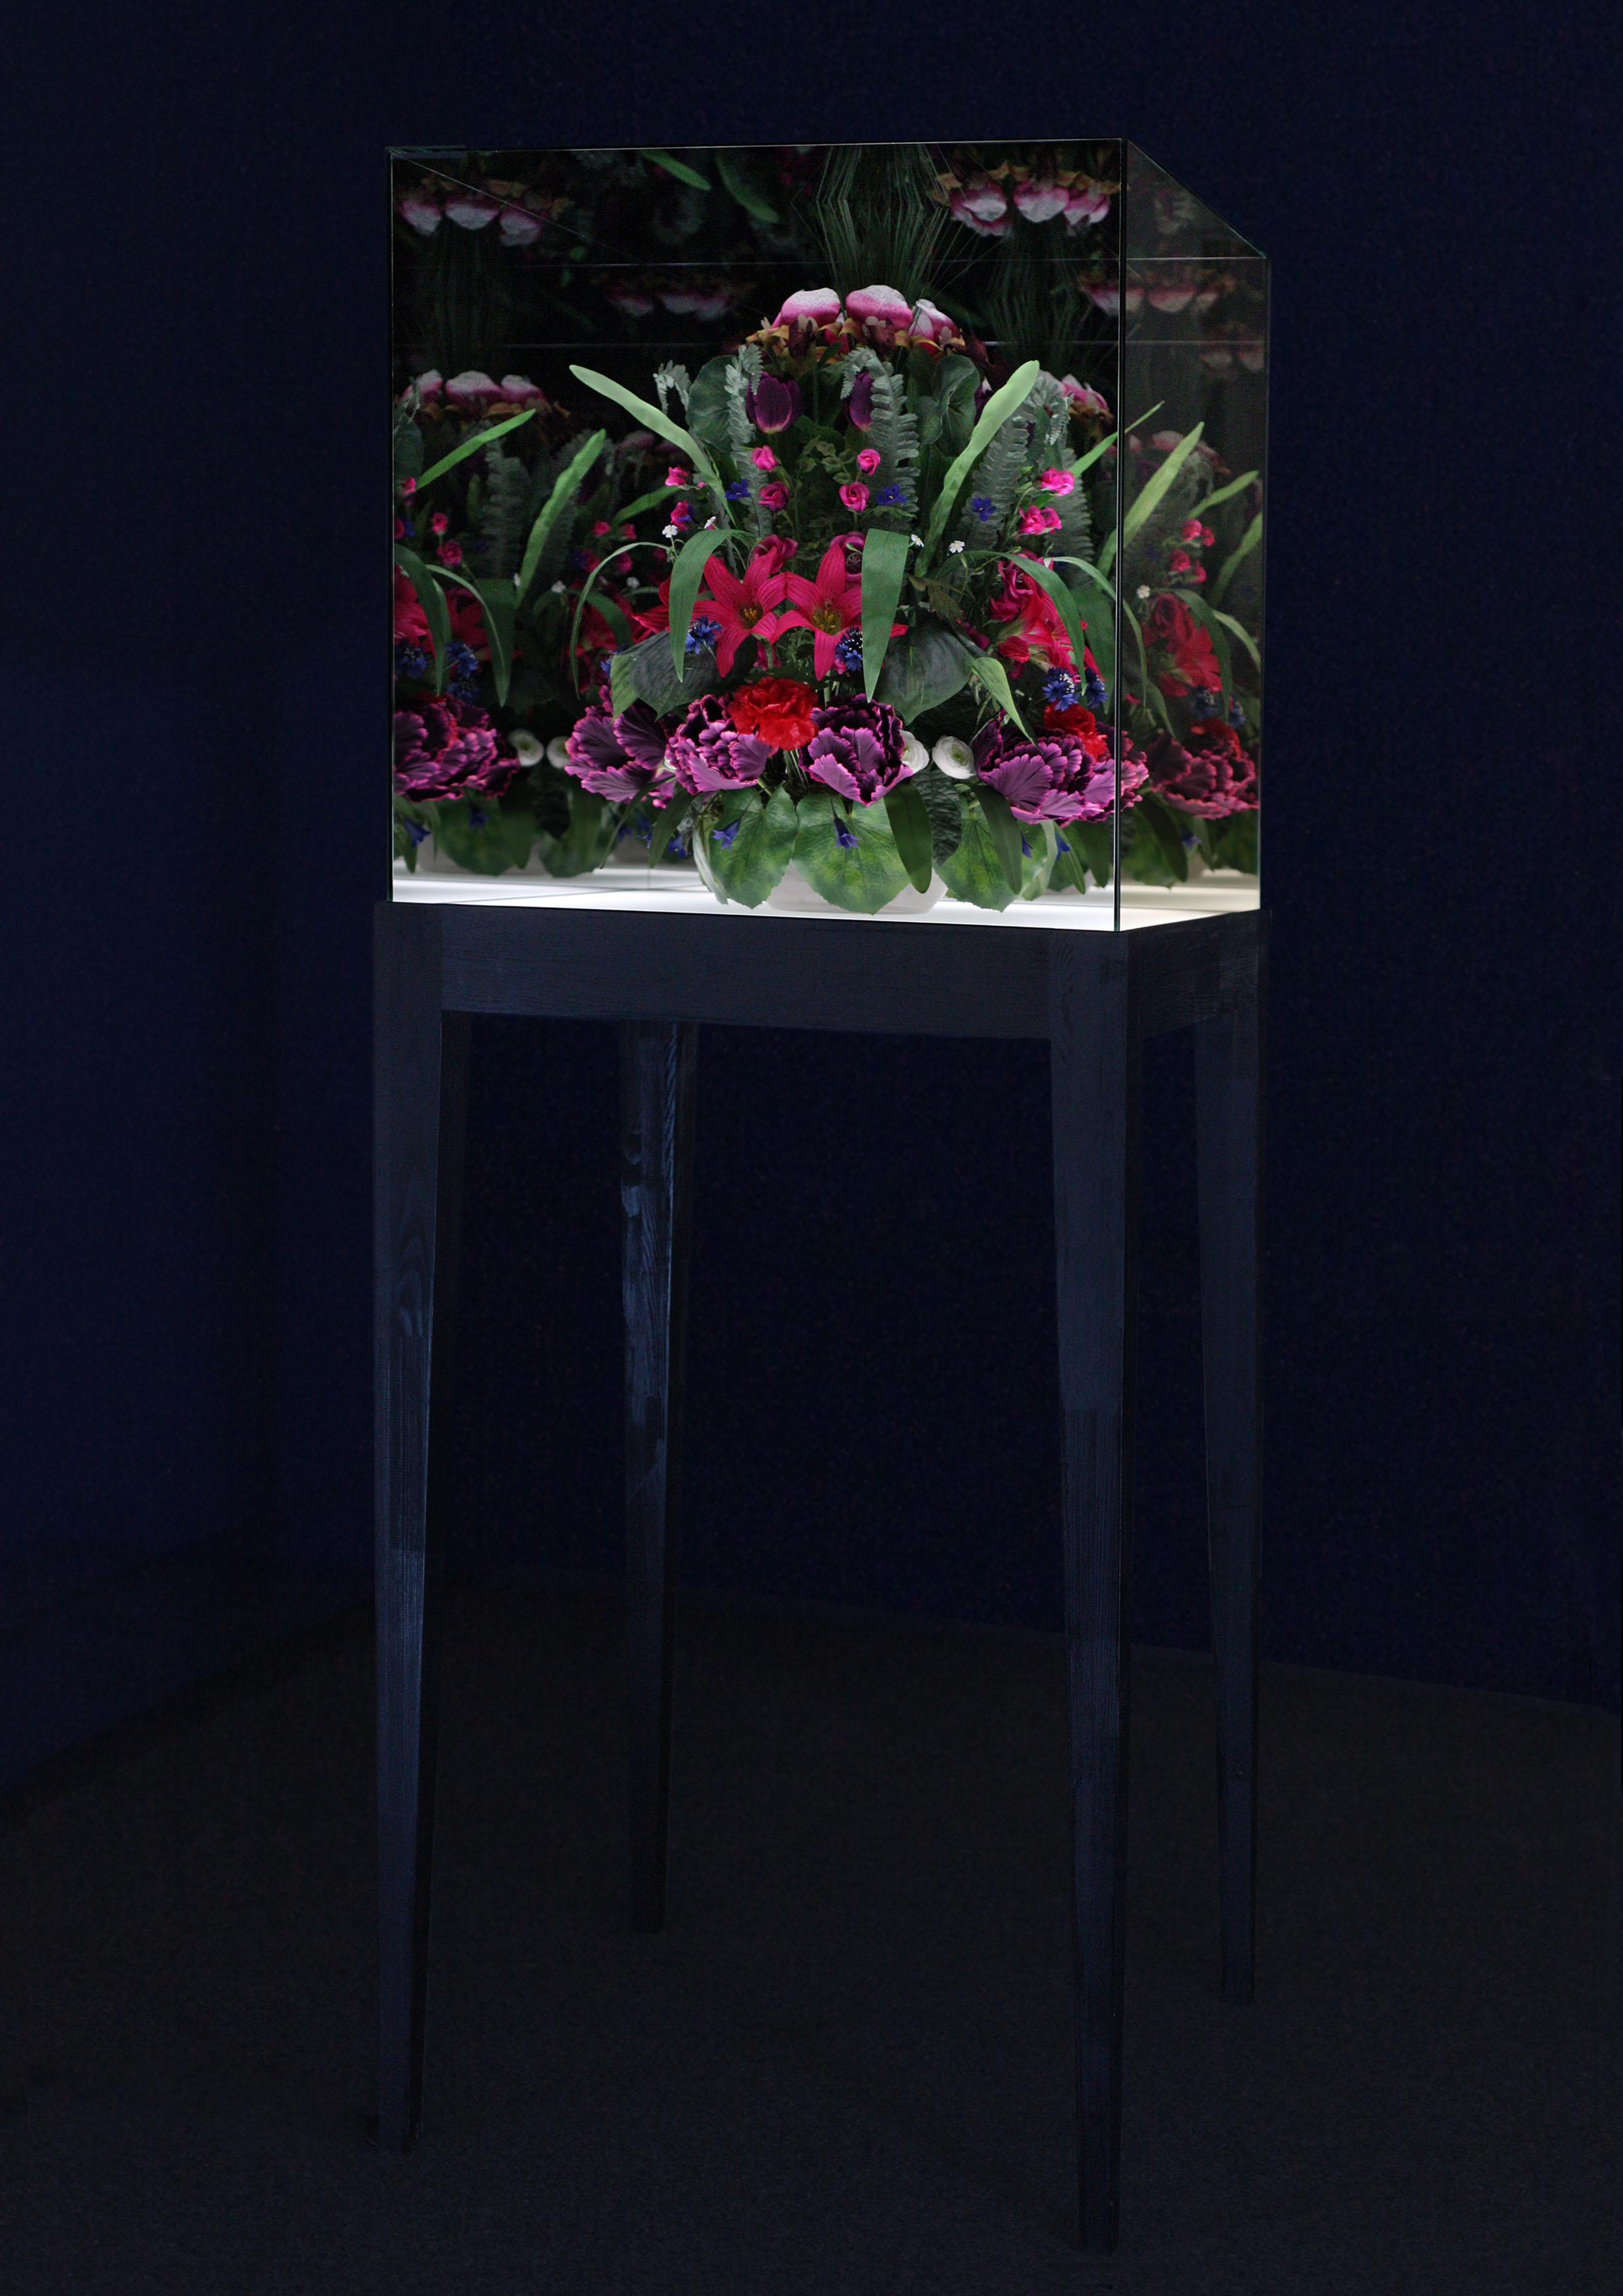 Doku-ALICE-Blumen-Hauptbild.jpg